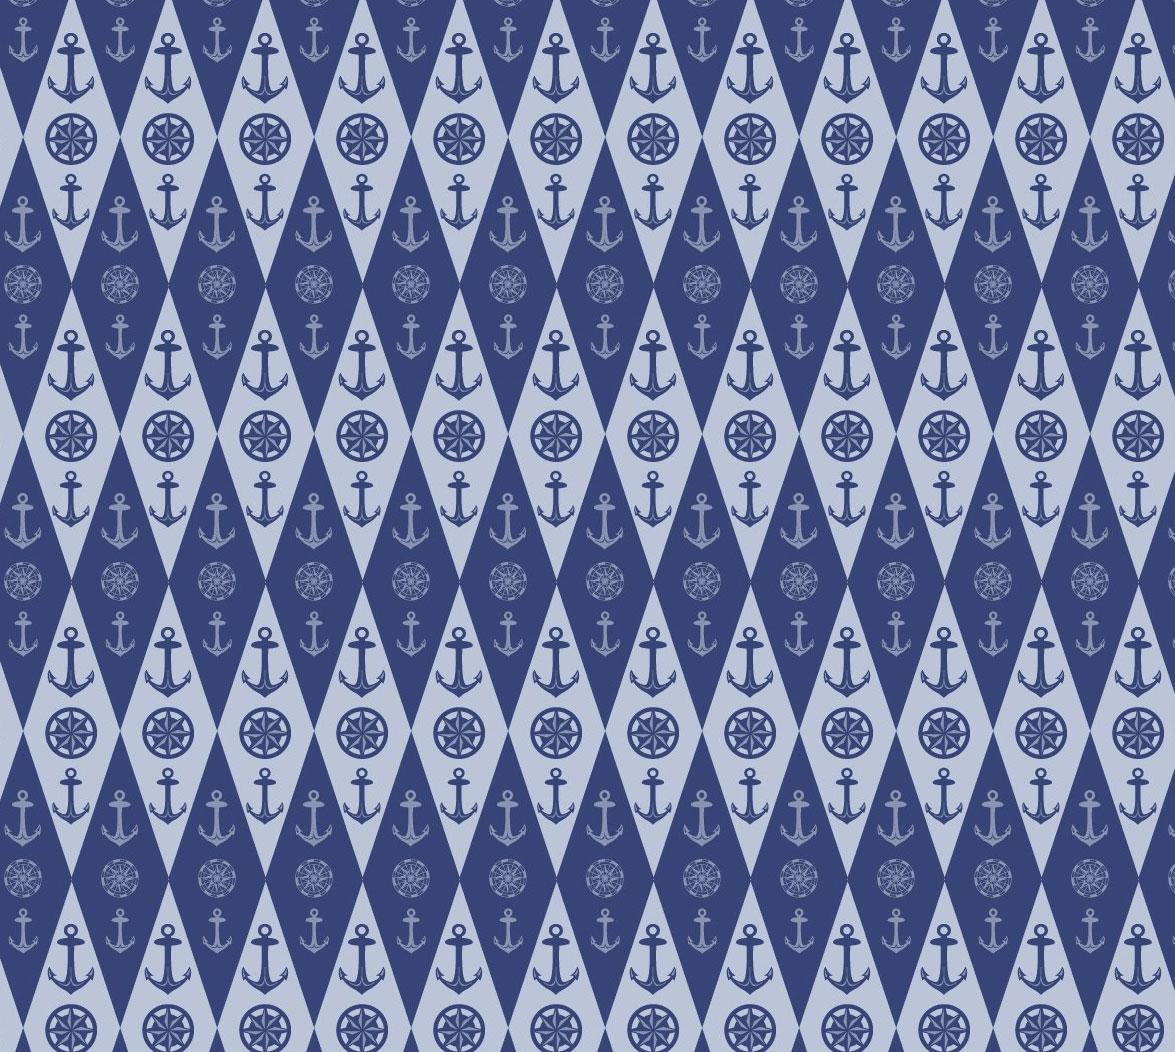 Stylish nautical themed surface pattern design